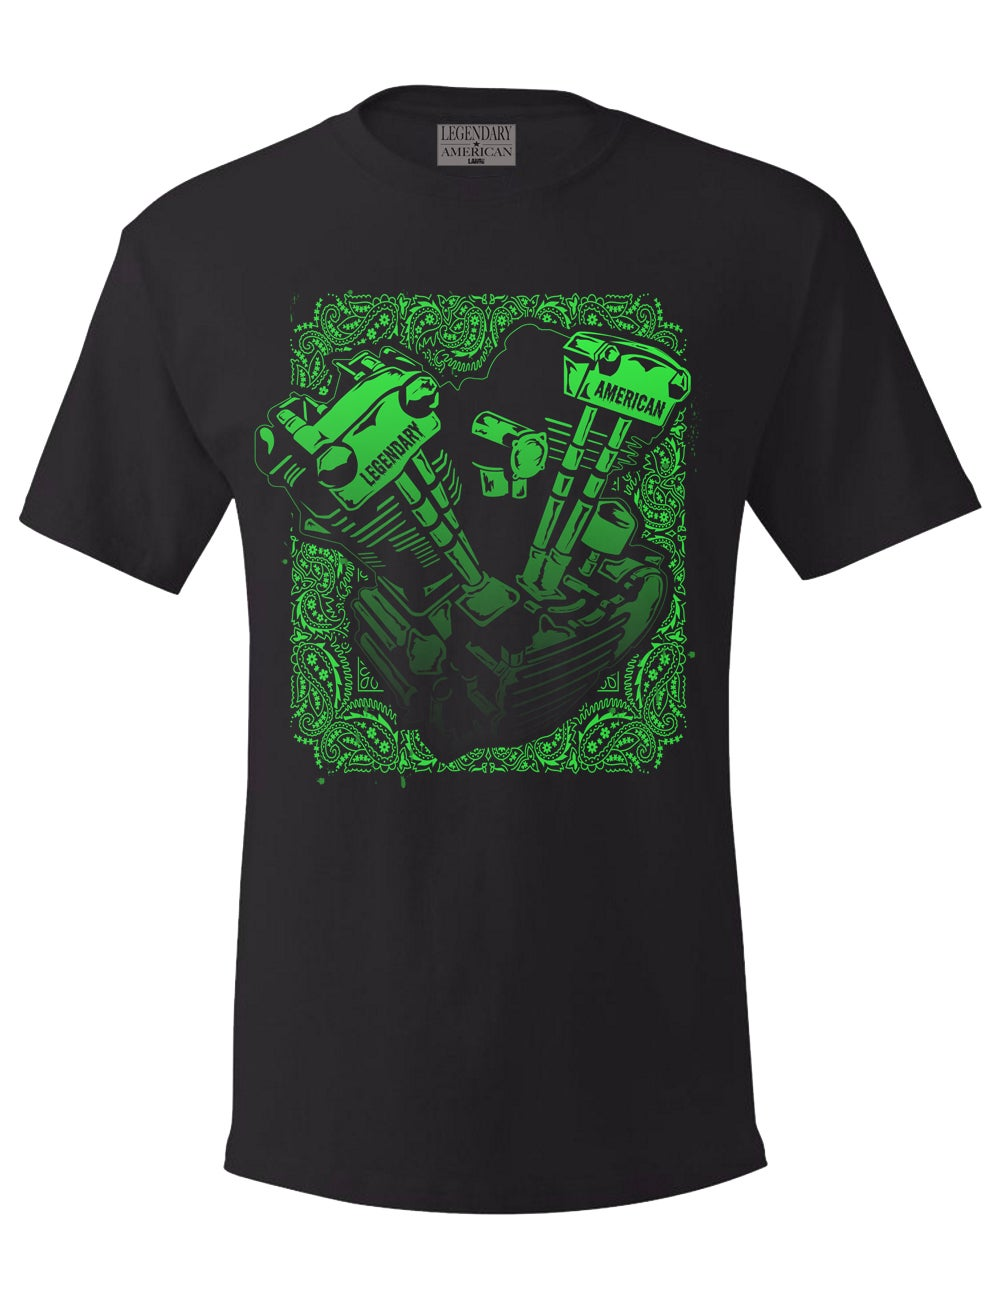 Image of Legendary American Knucklehead tee - green print